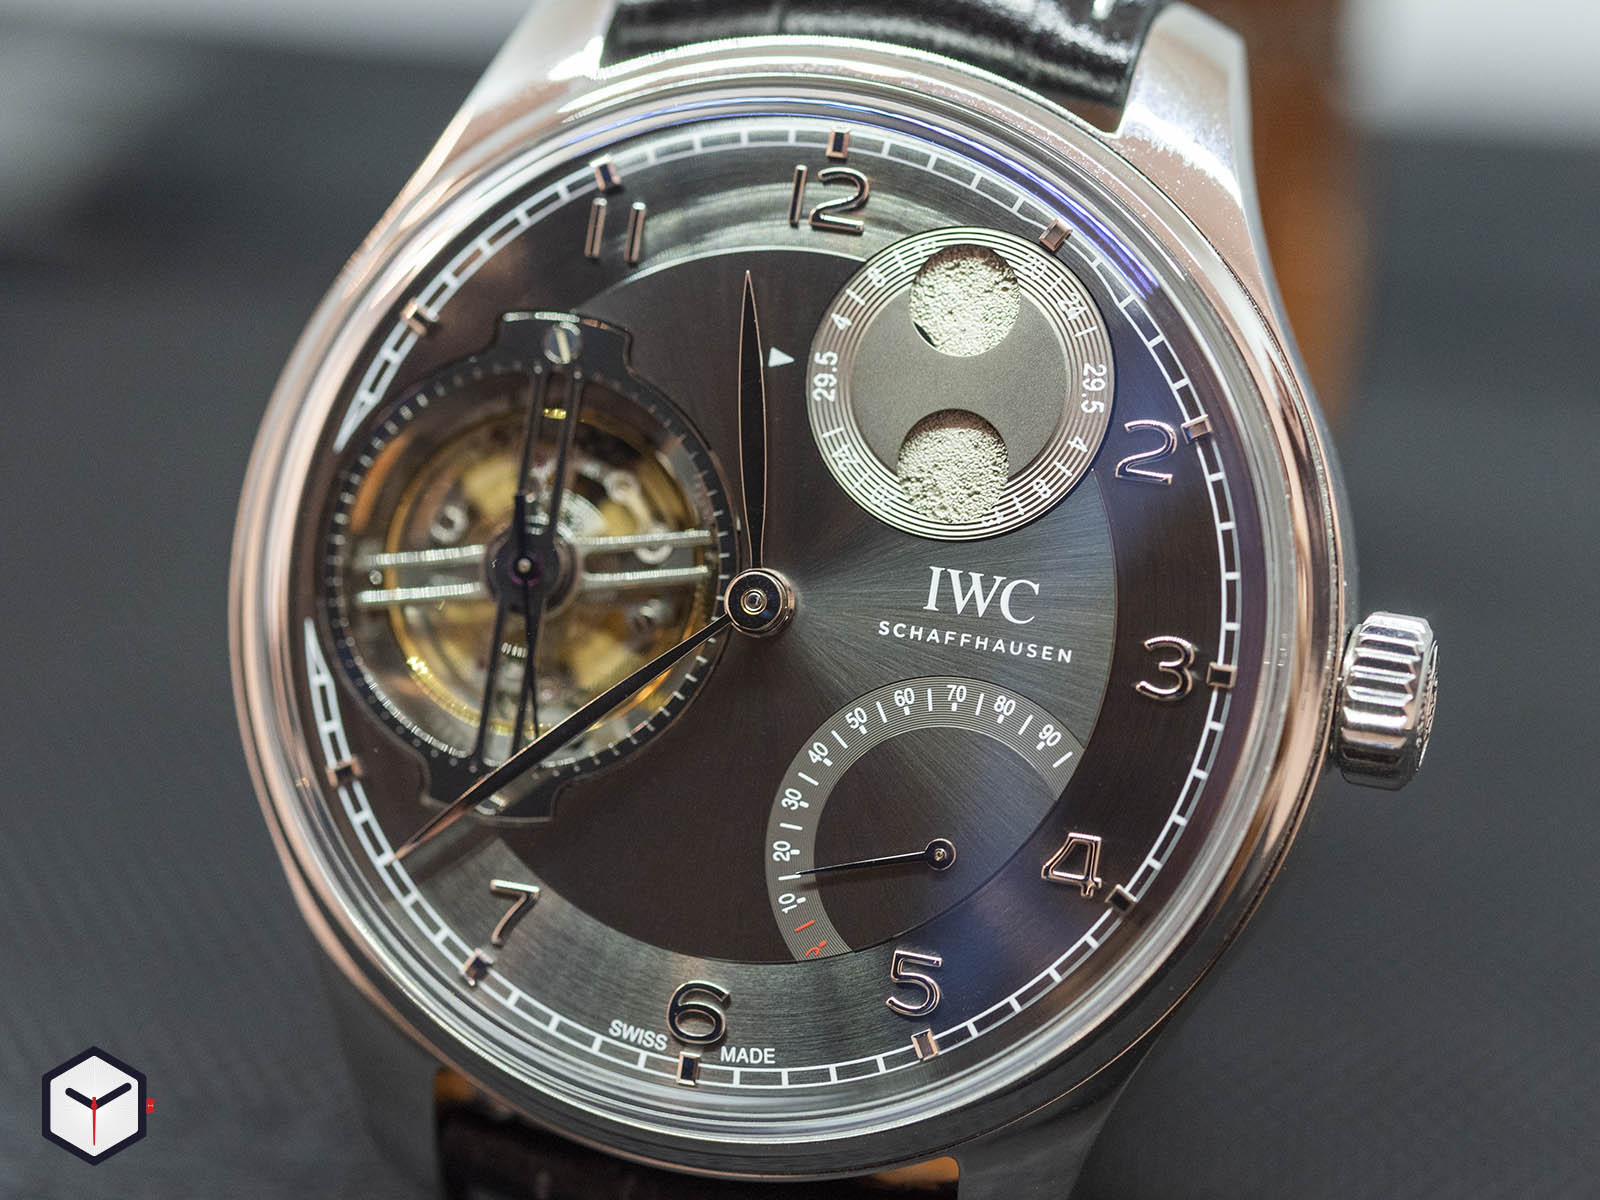 iwc-portugieser-constant-force-tourbillon-platinum-3.jpg